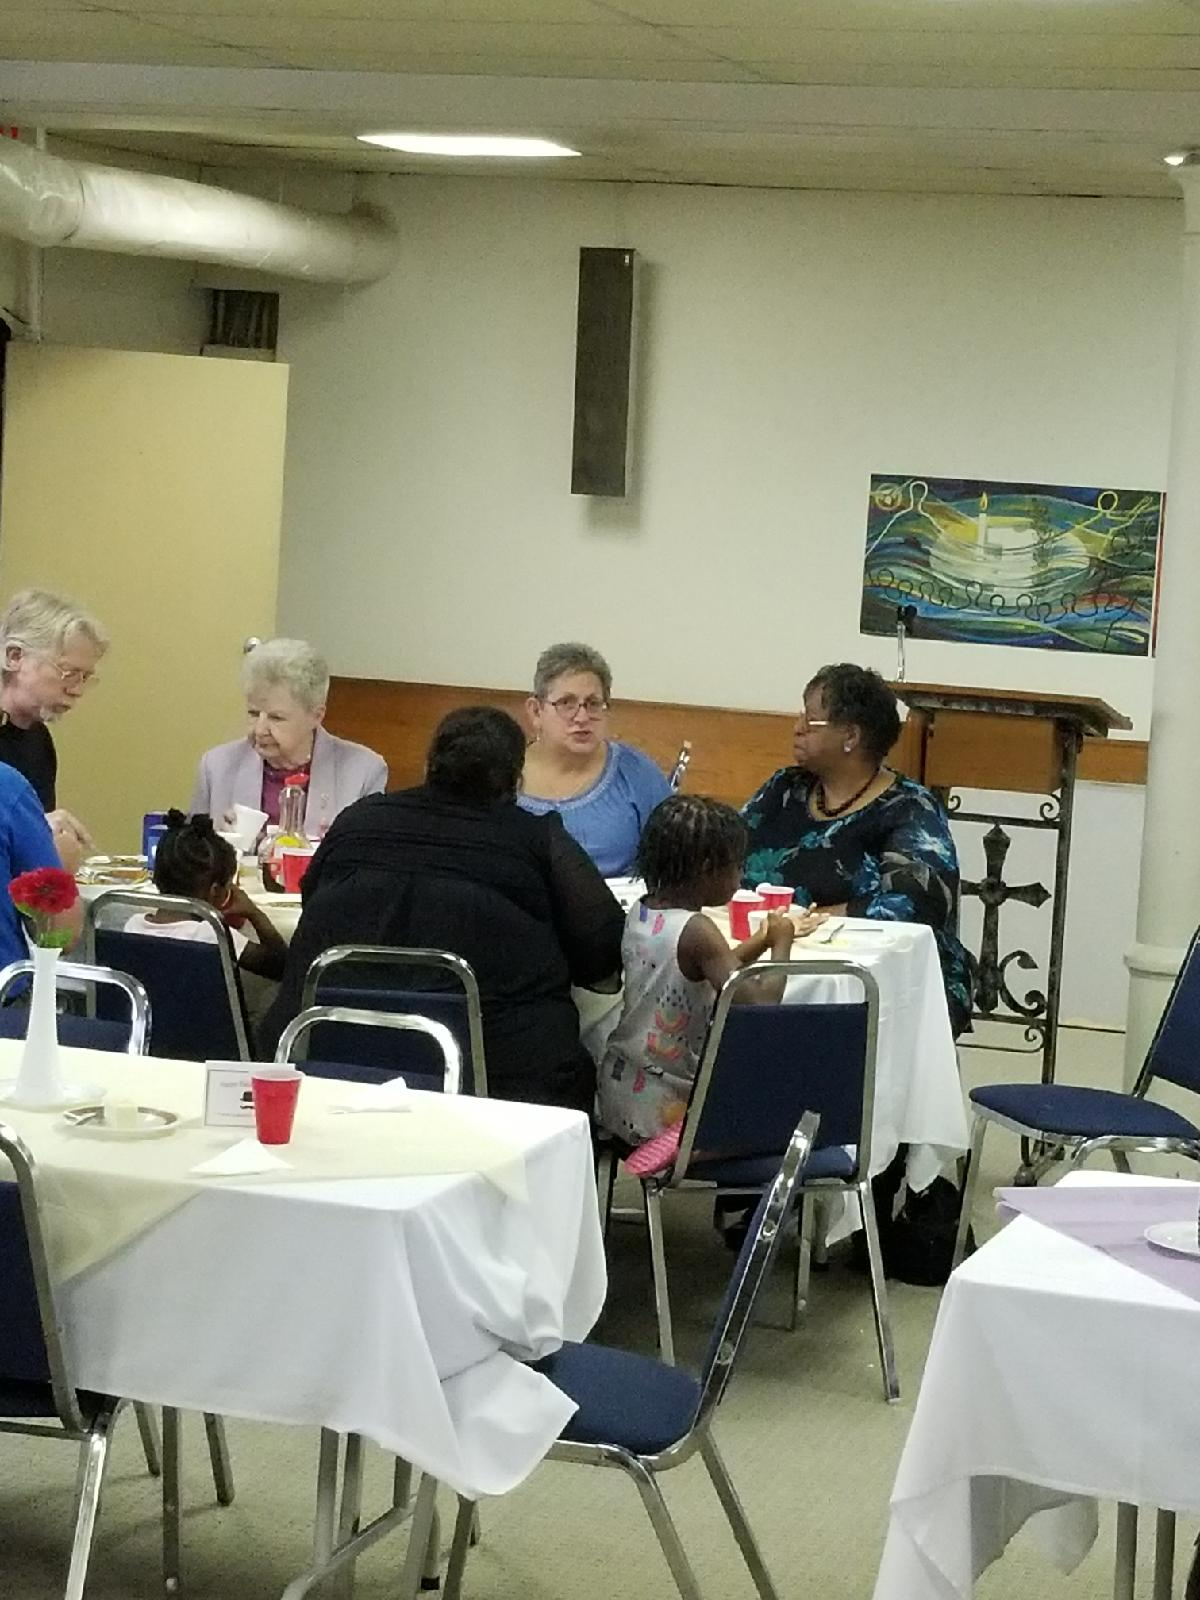 St. Thomas Community